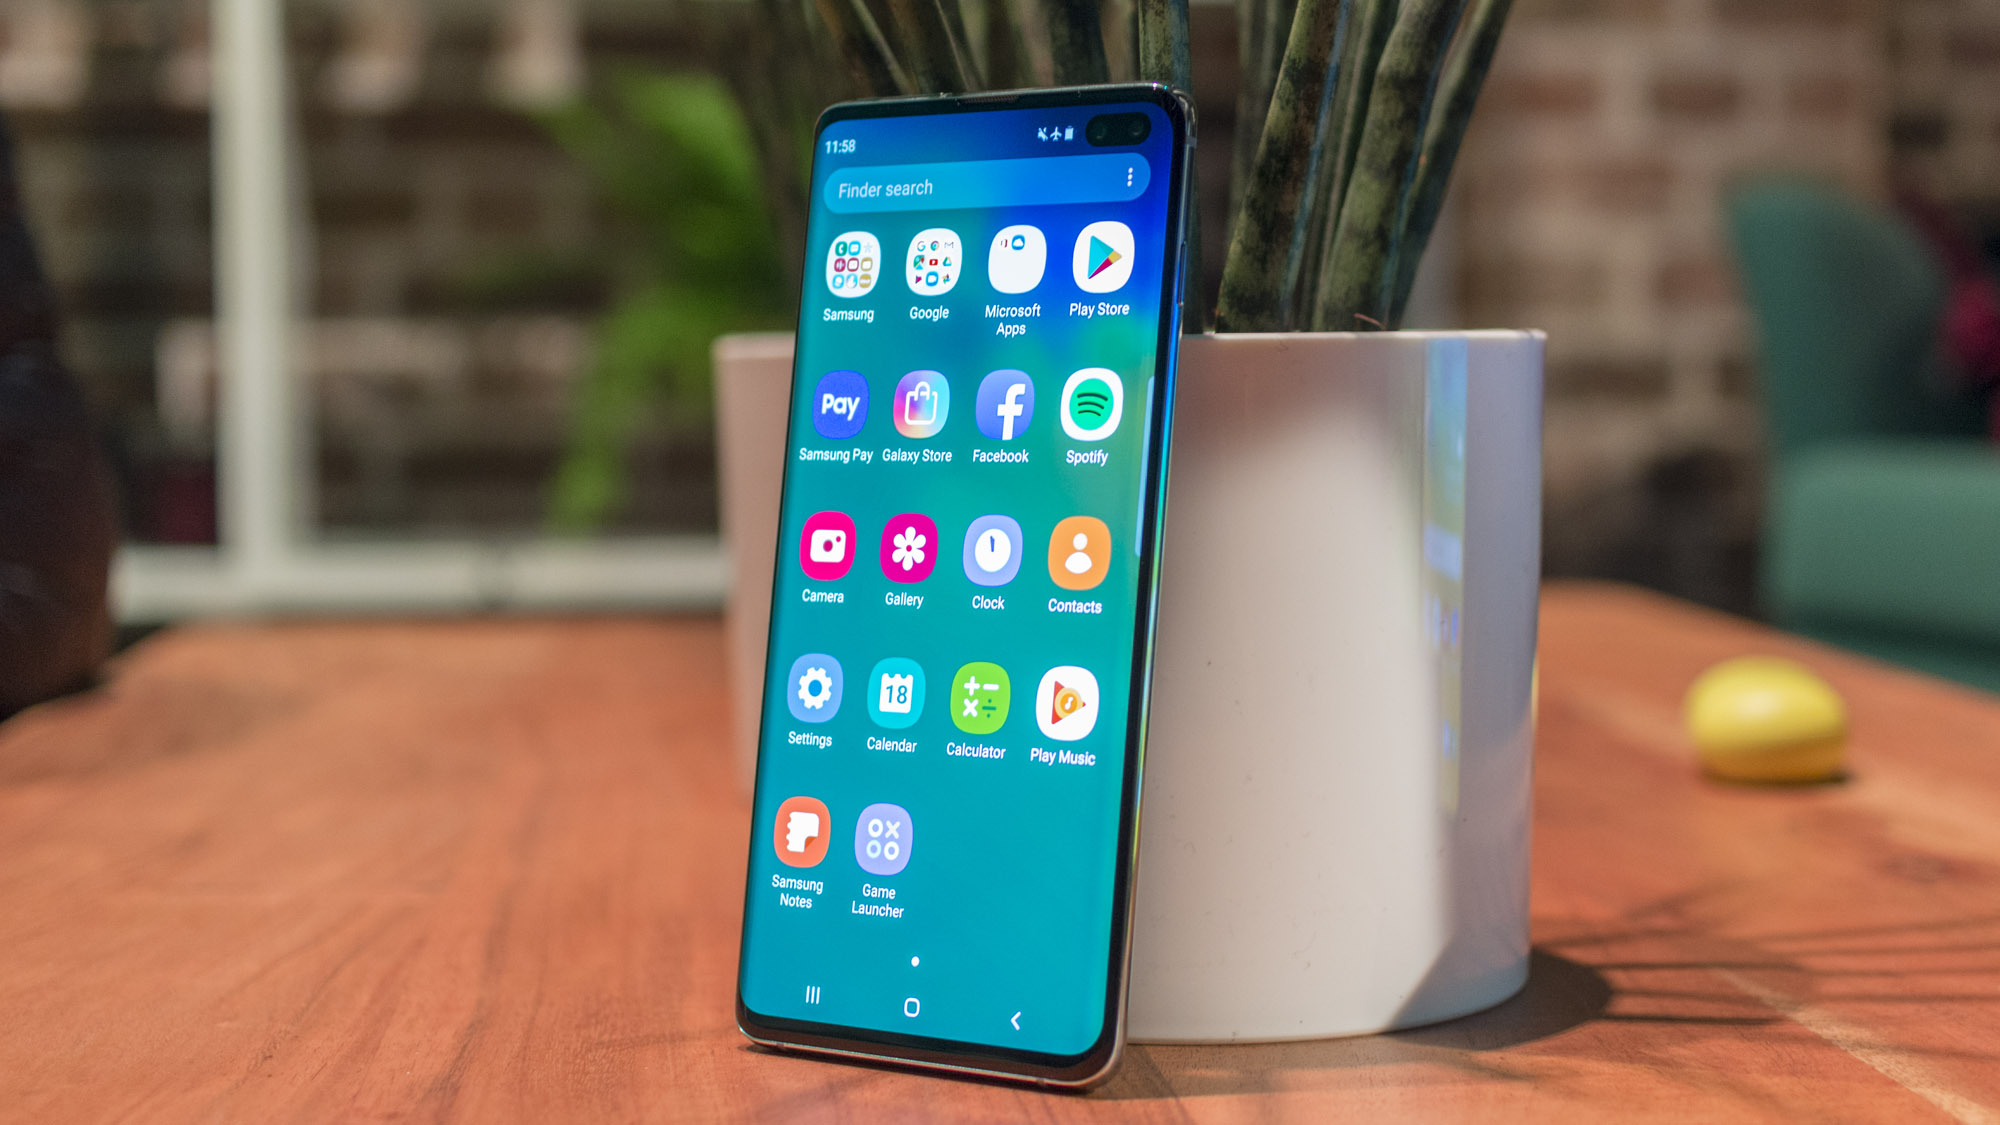 مقارنة بين الهواتف الأفضل Samsung Galaxy S10 Plus وهاتف Sony Xperia 1 وهاتف LG V50 ThinQ 5G